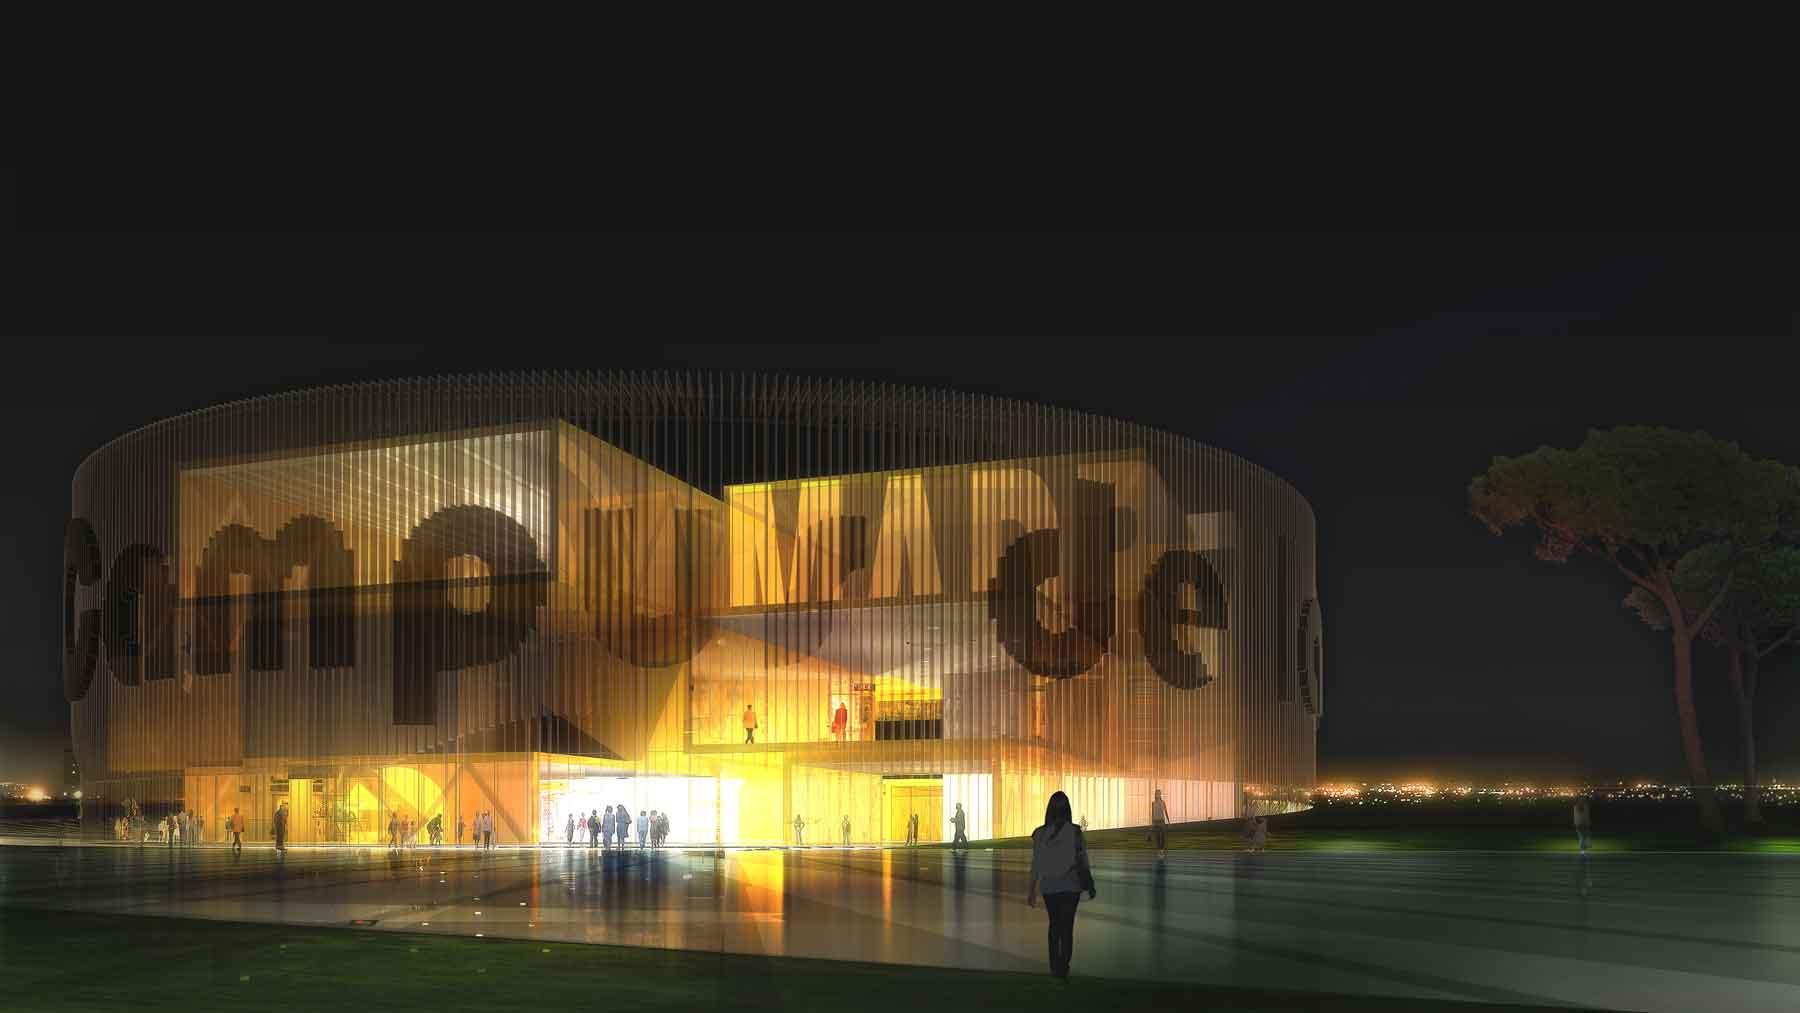 campus-justicia.competition.architecture.02